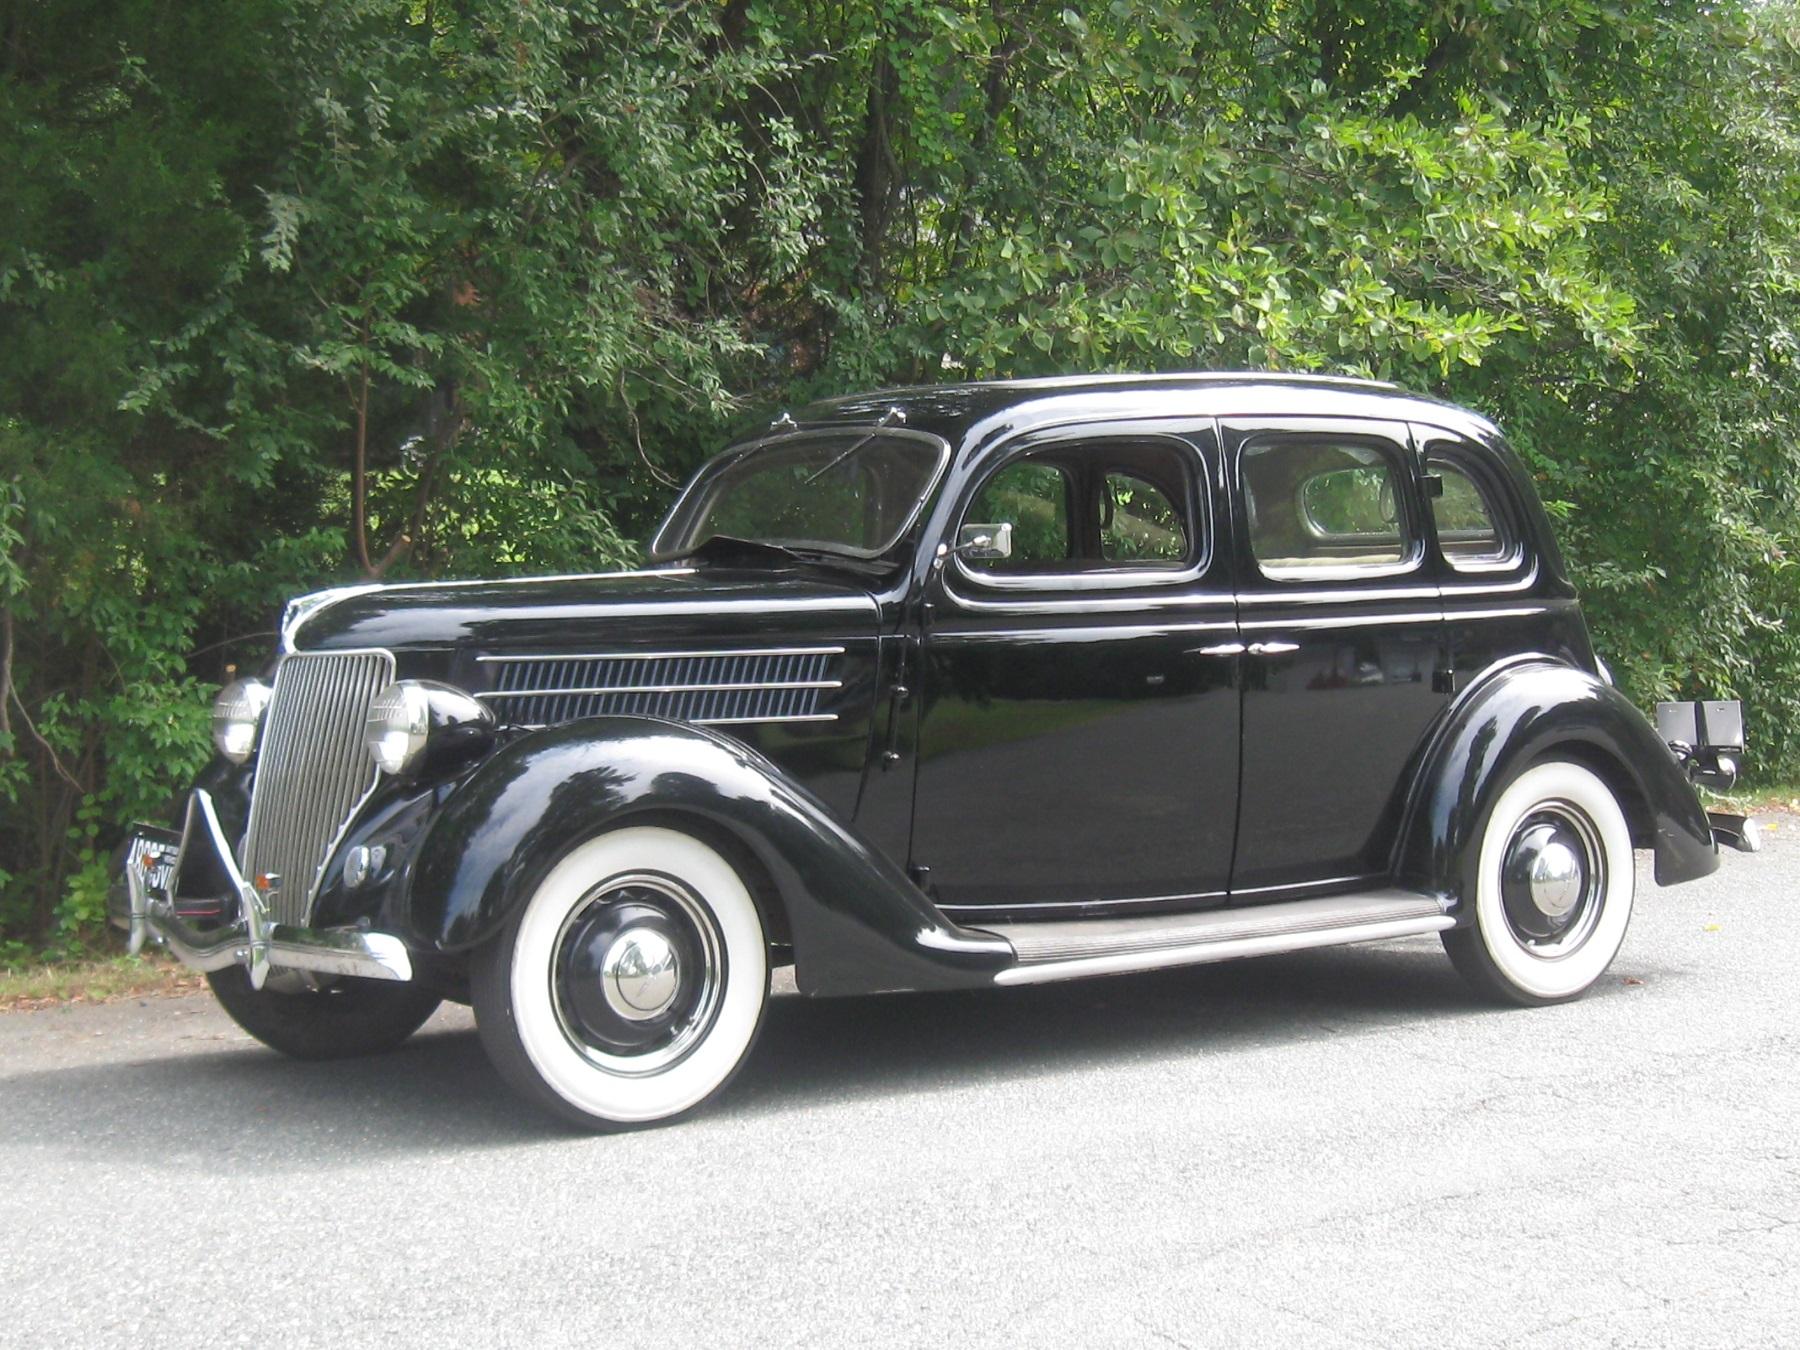 ford slantback a 1936 beauty classic classics groovecar. Black Bedroom Furniture Sets. Home Design Ideas